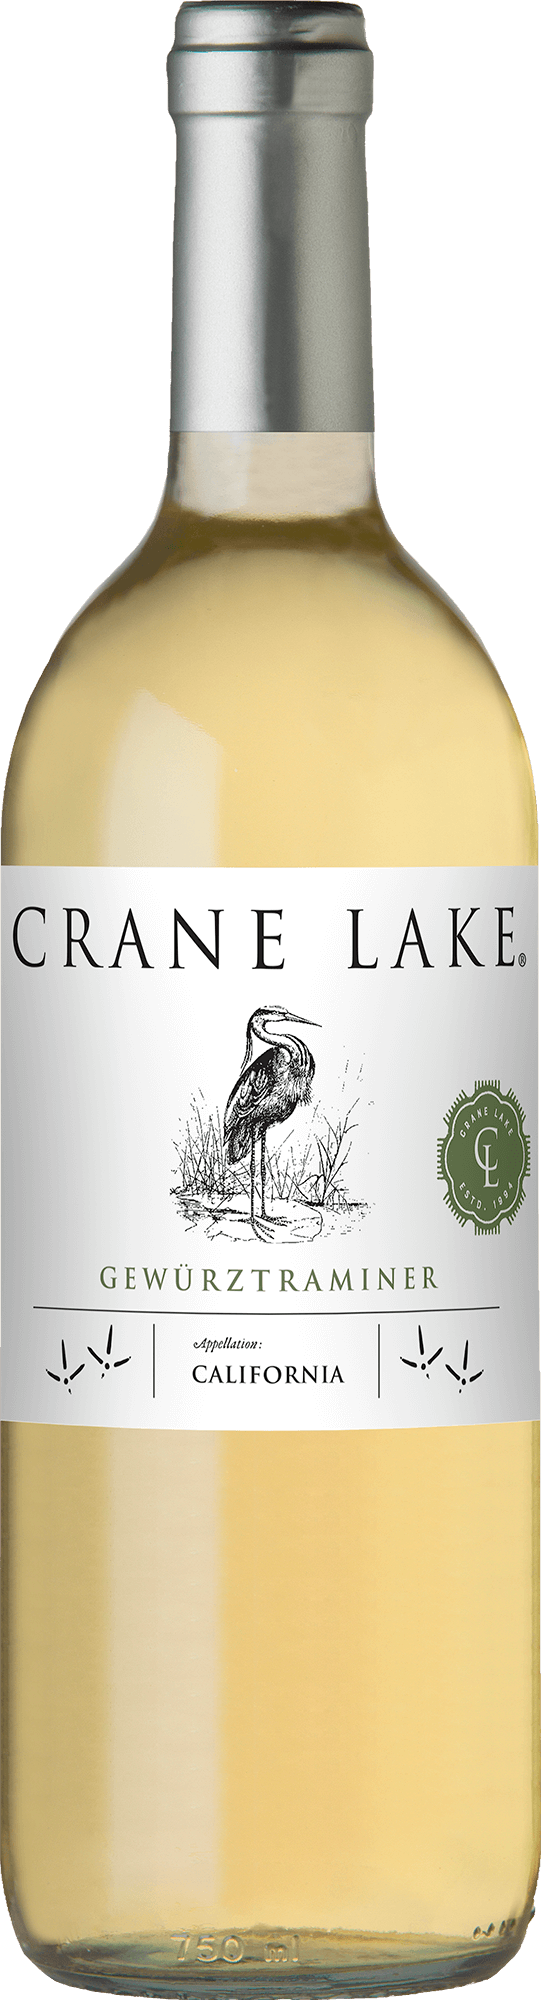 Crane Lake Gerwurztraminer Bottleshots